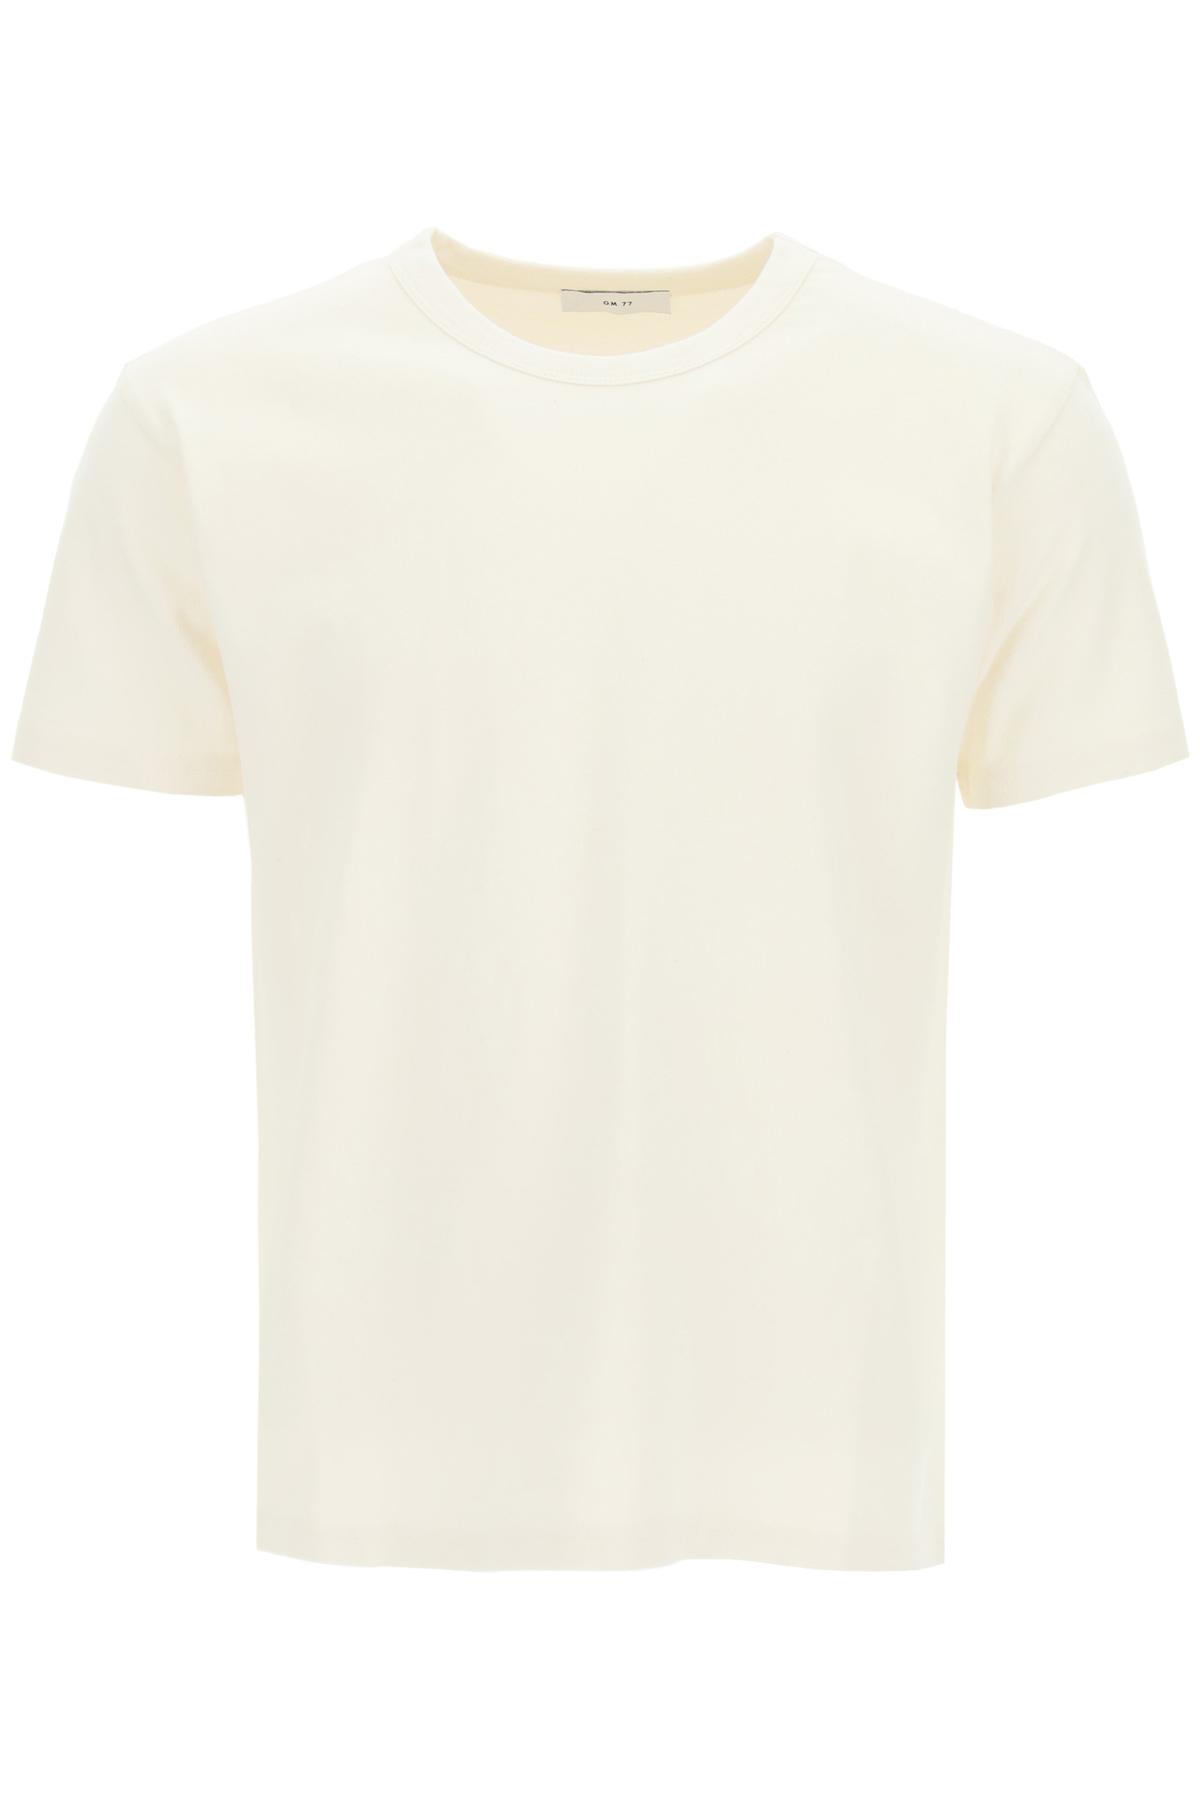 Gm77 t-shirt girocollo